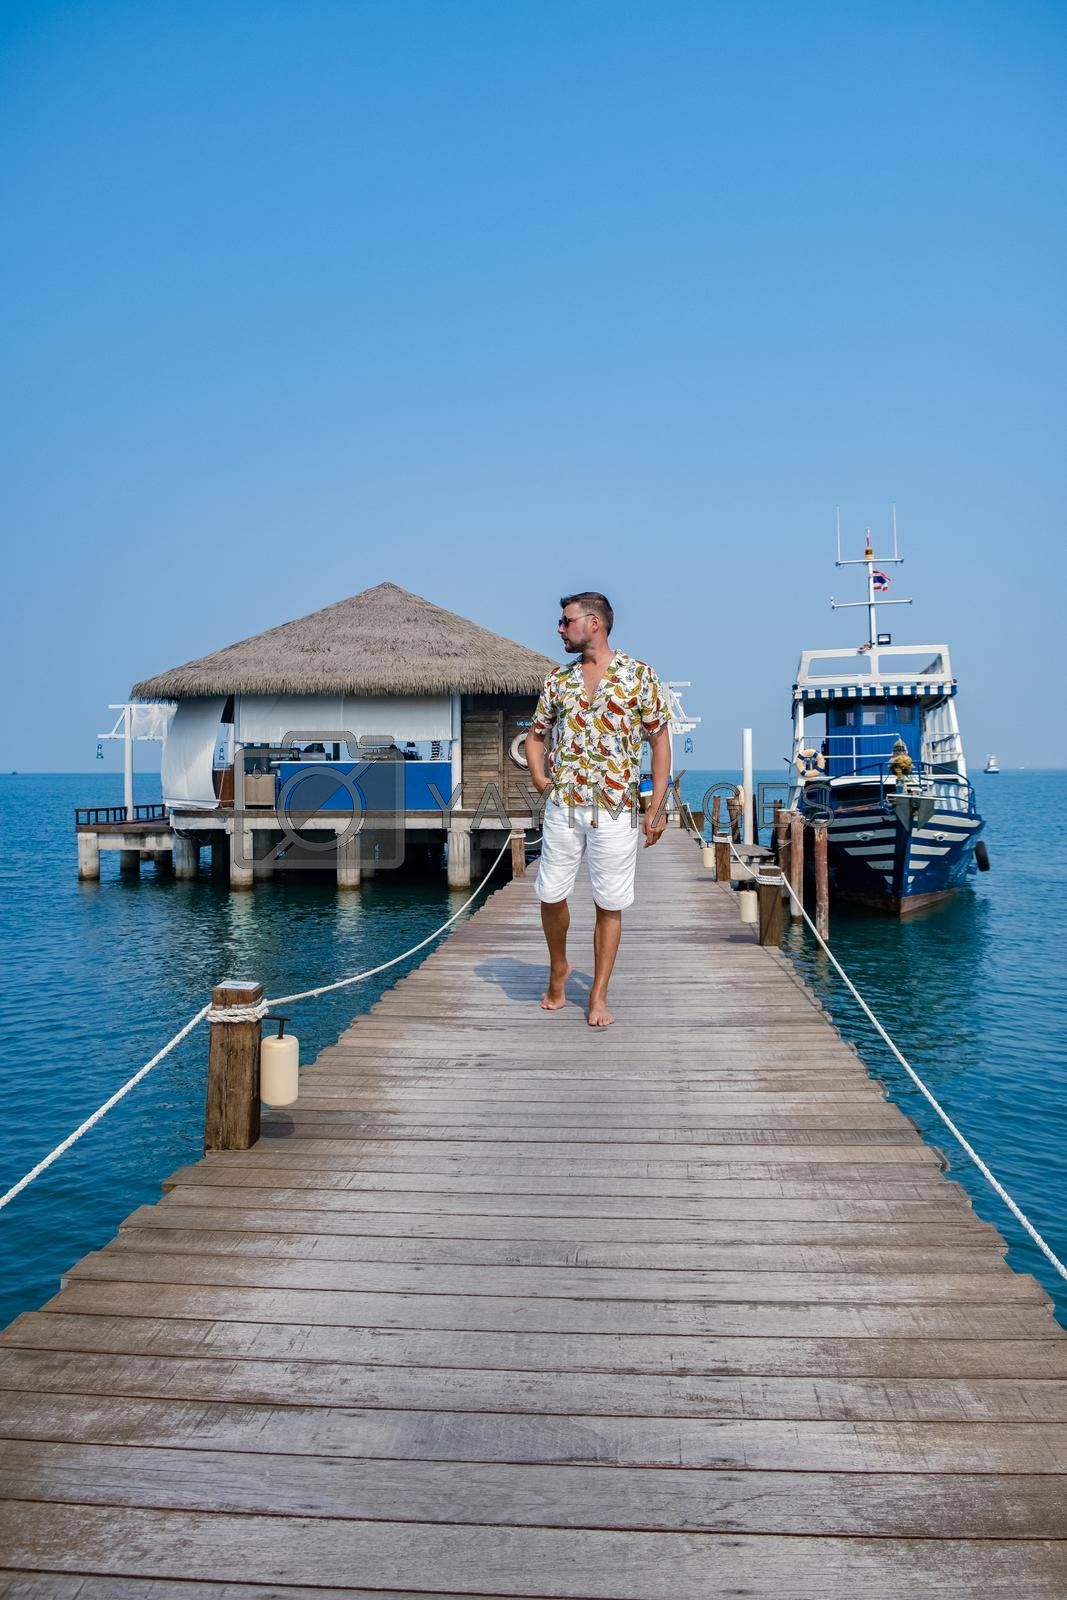 Royalty free image of wooden pier in ocean Pattaya Bangsaray beach Thailand, man walking on wooden pier during vacation Thailand by fokkebok